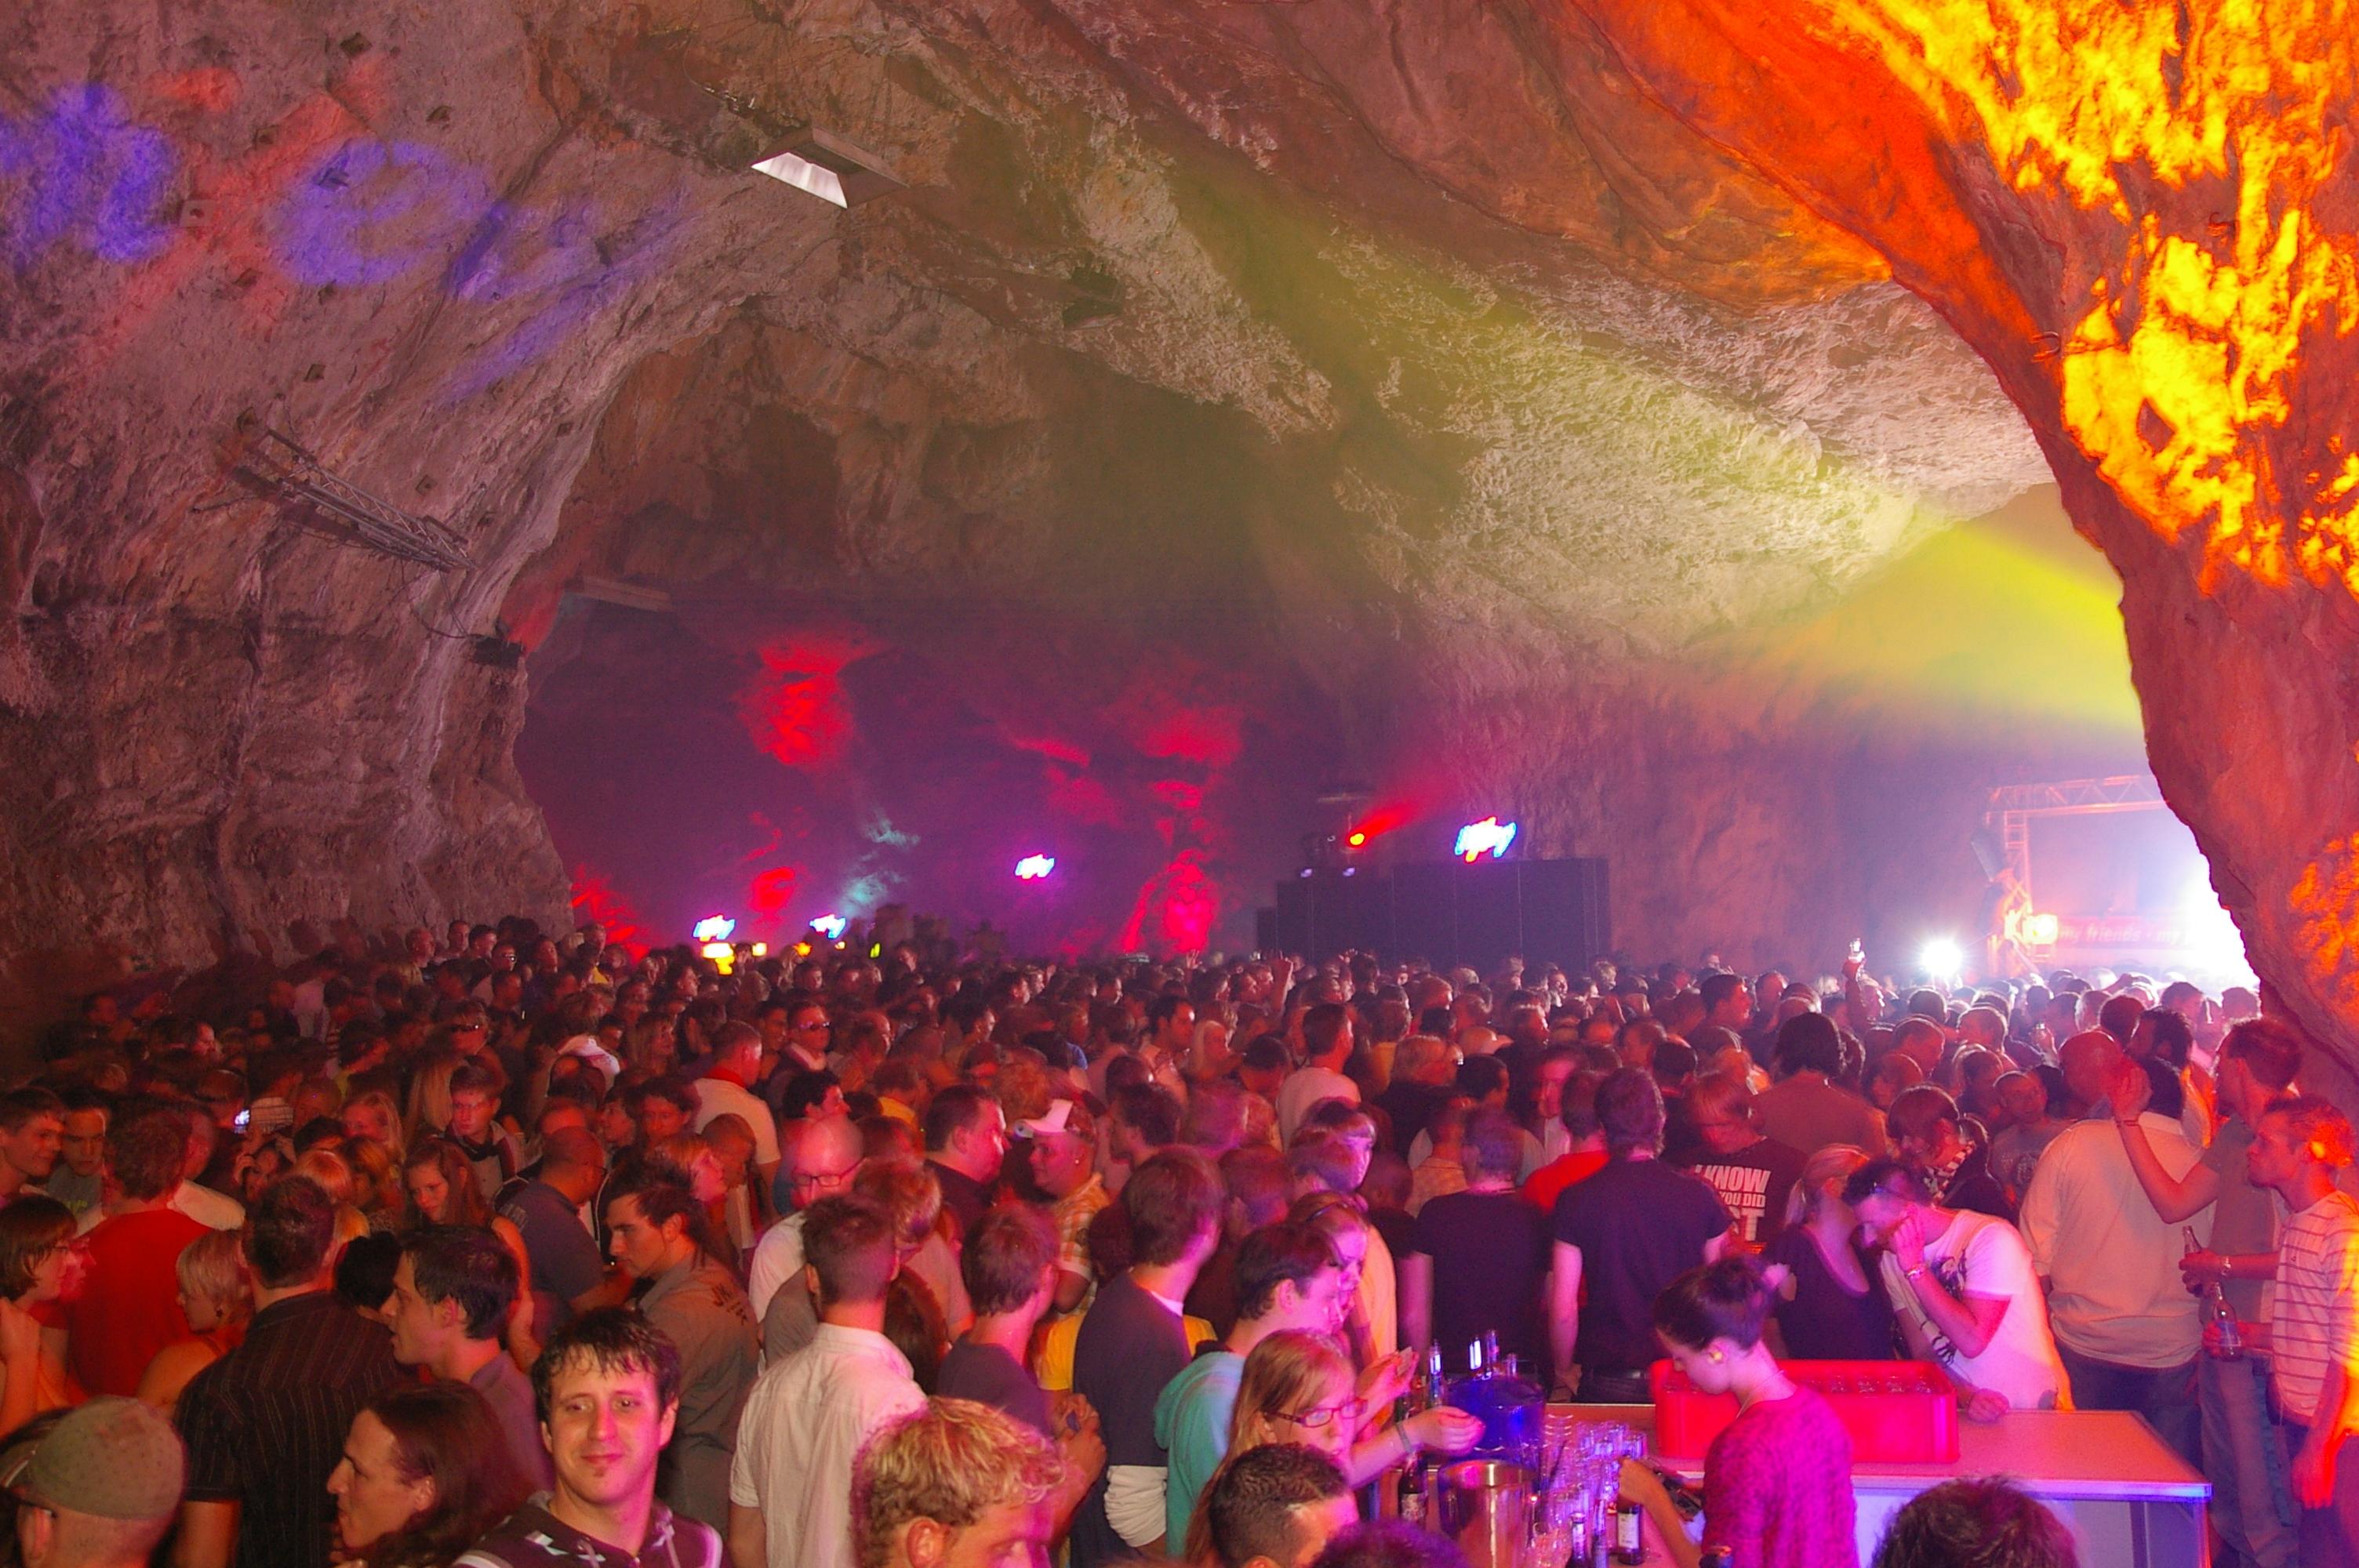 Samstag, 8. September 2012: ab zum Mixery Cave!